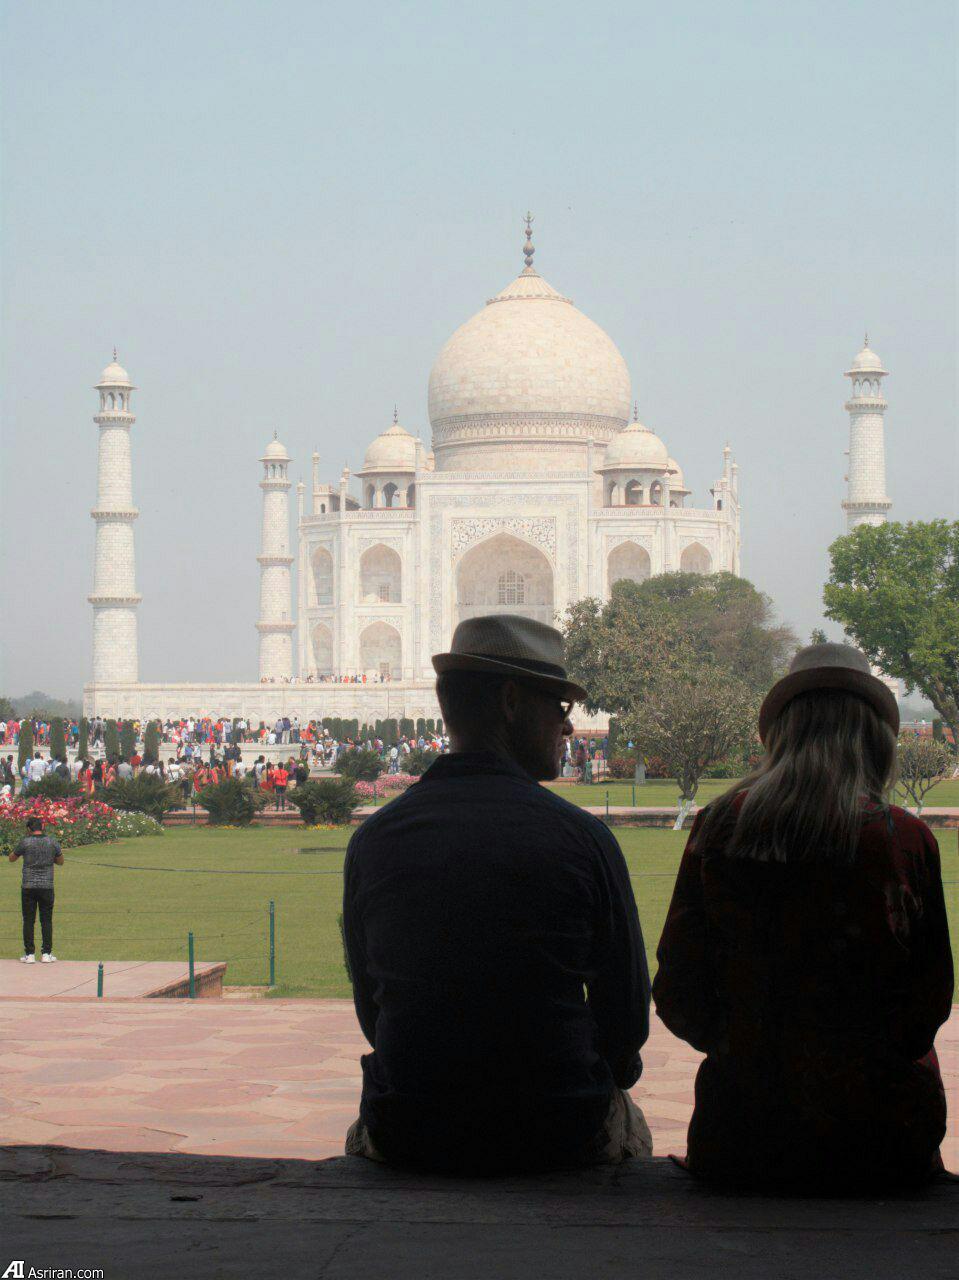 سفر به کشور 72 ملت - تاج محل؛ بنای عاشقانه (+عکس)